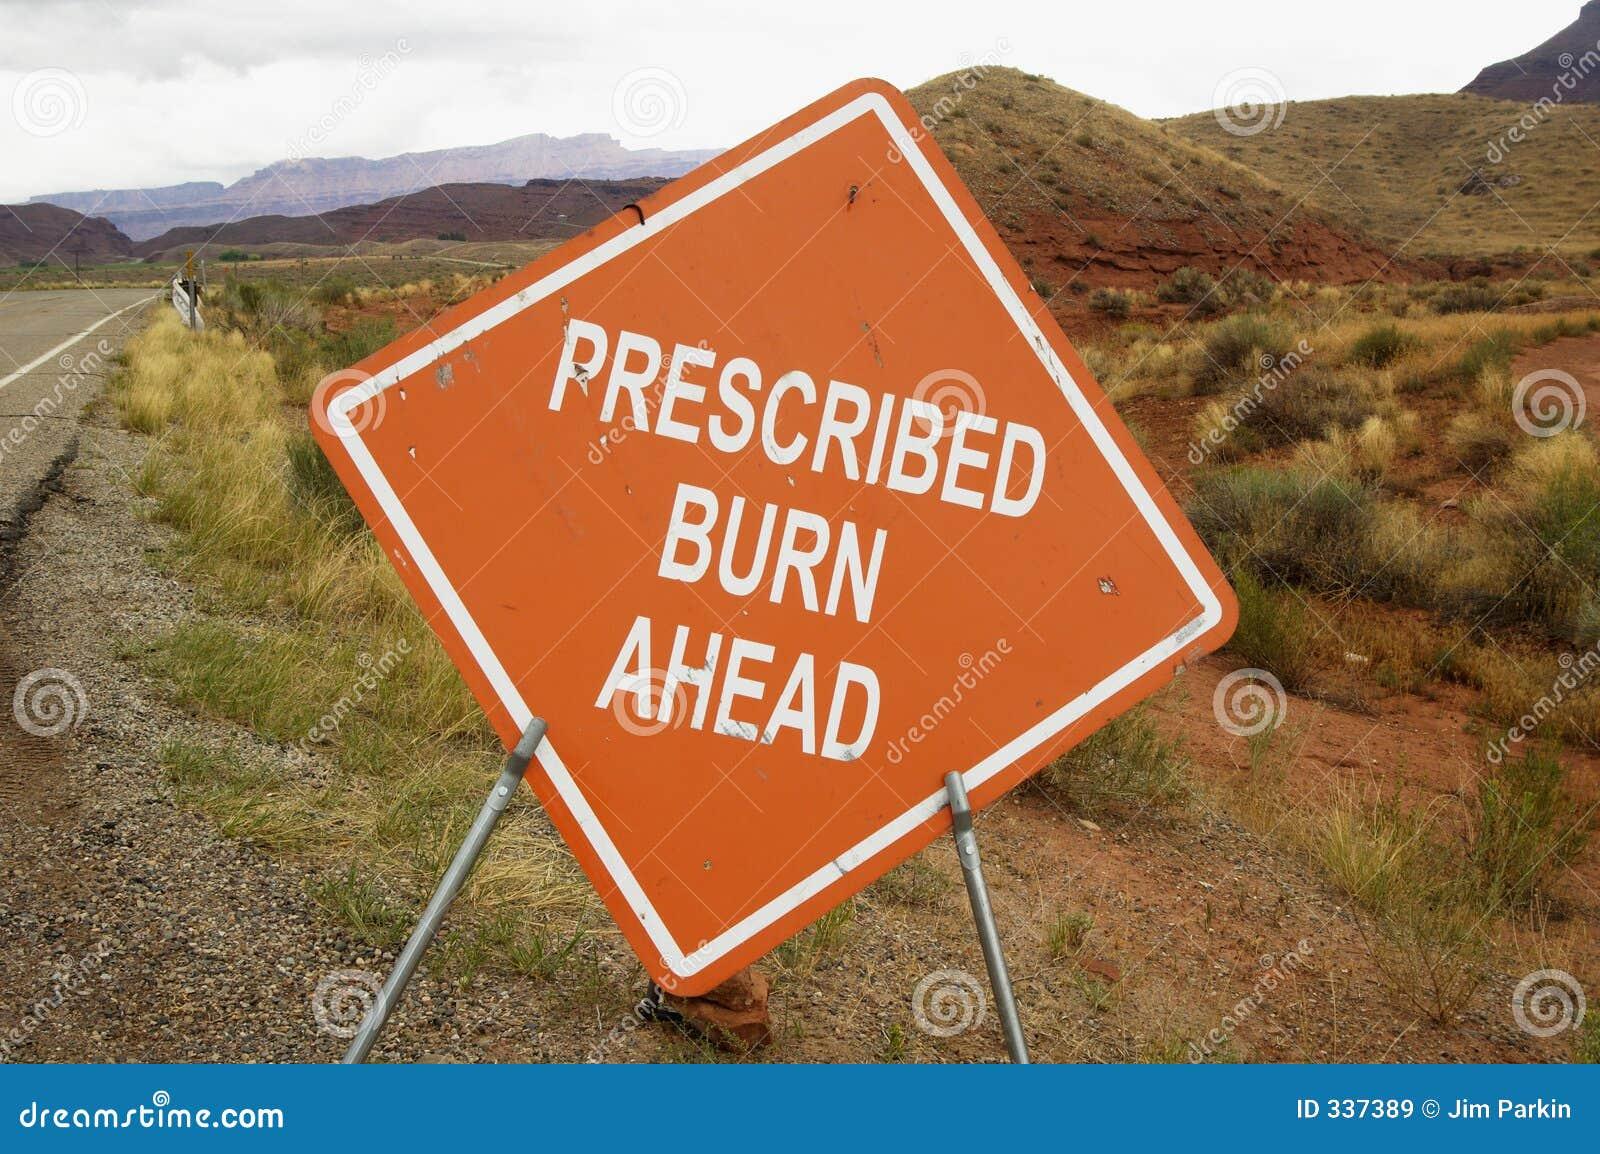 Prescribed burn sign